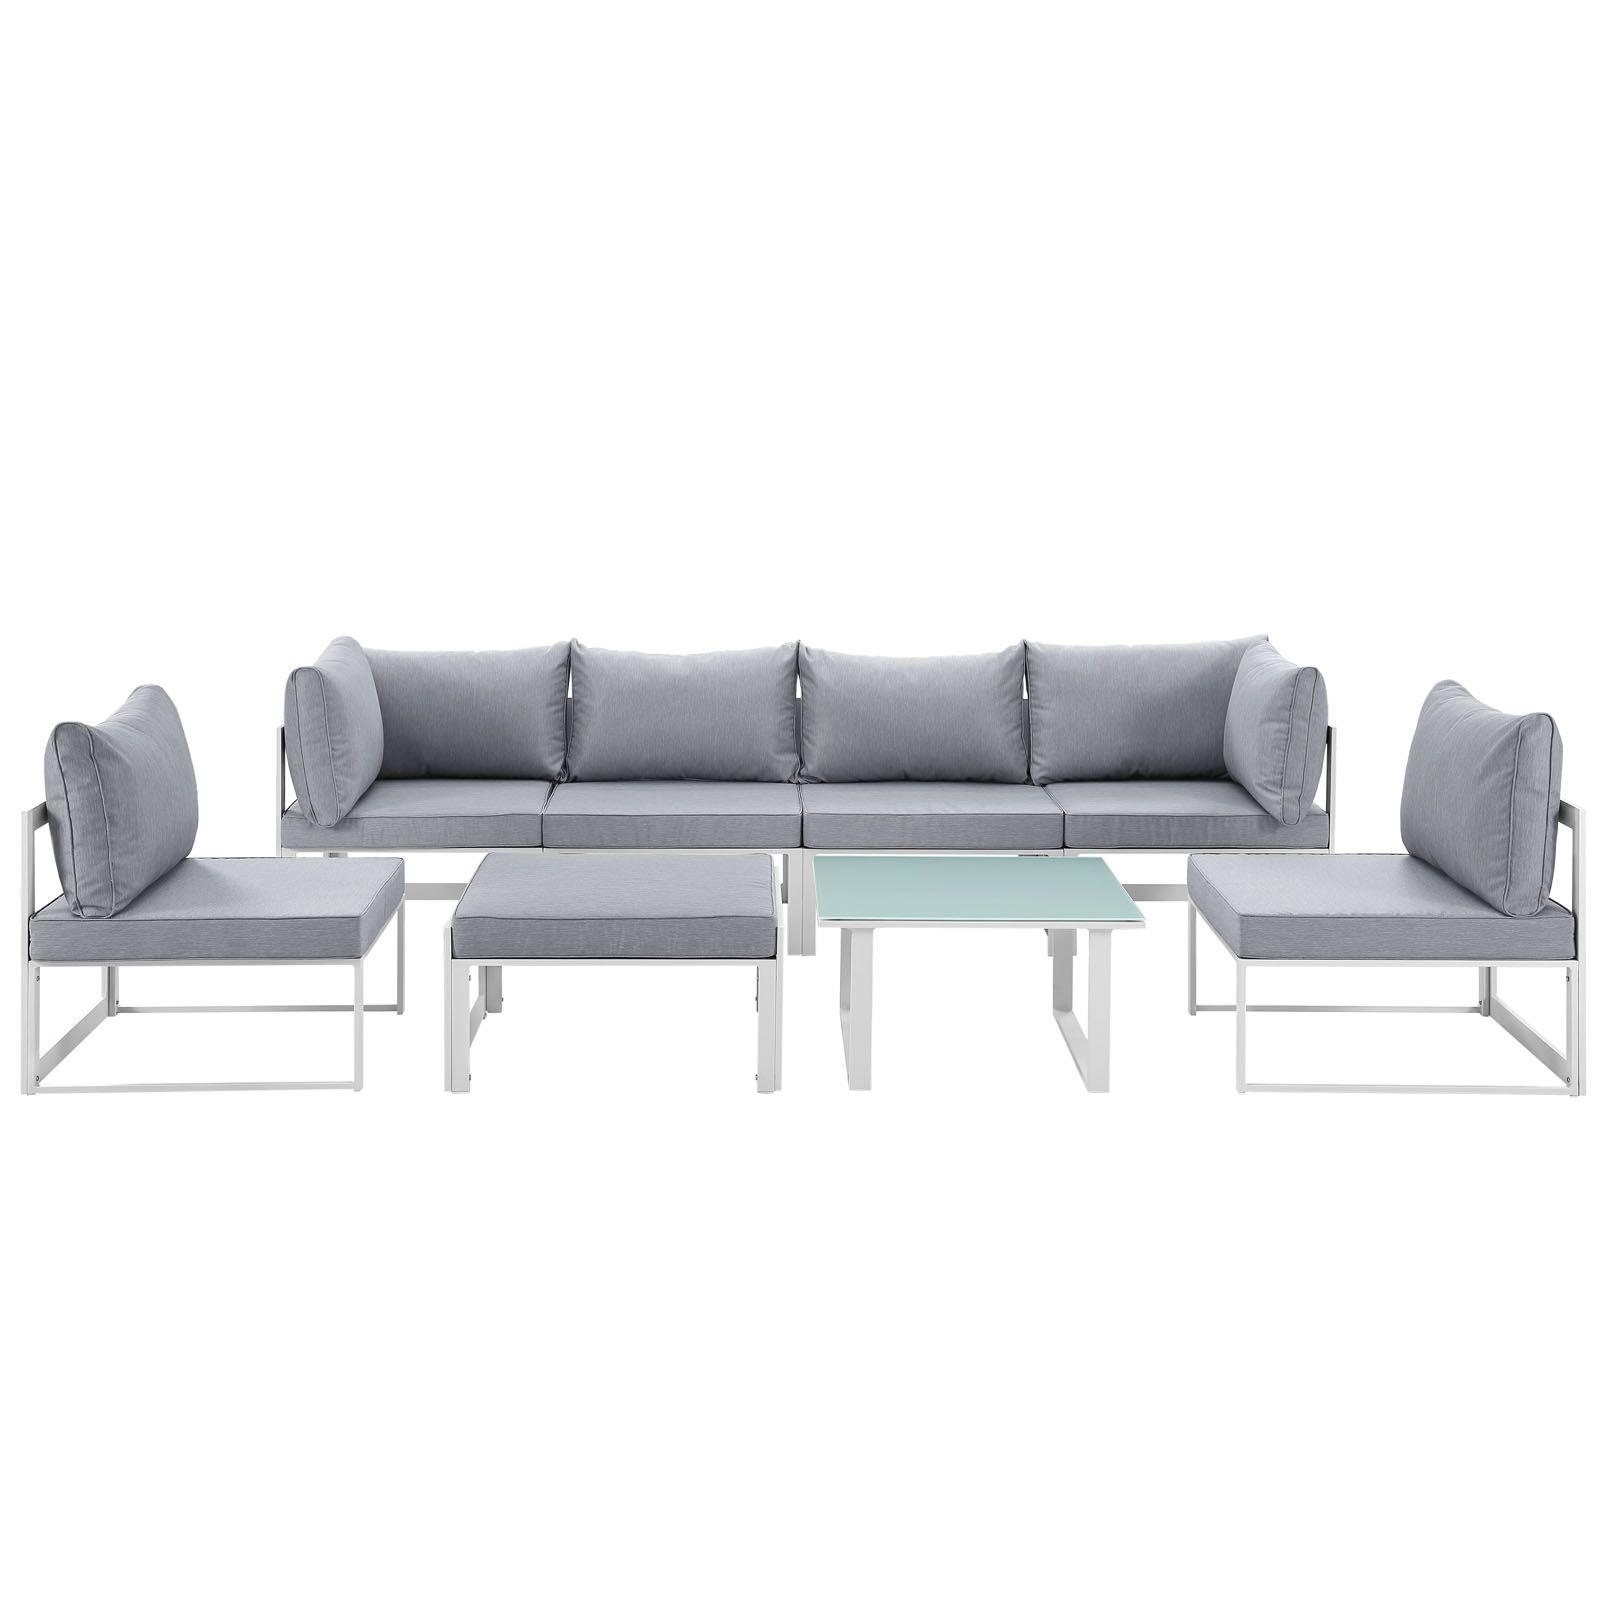 Modway Furniture - Fortuna 8 Piece Outdoor Patio Sectional Sofa Set ...